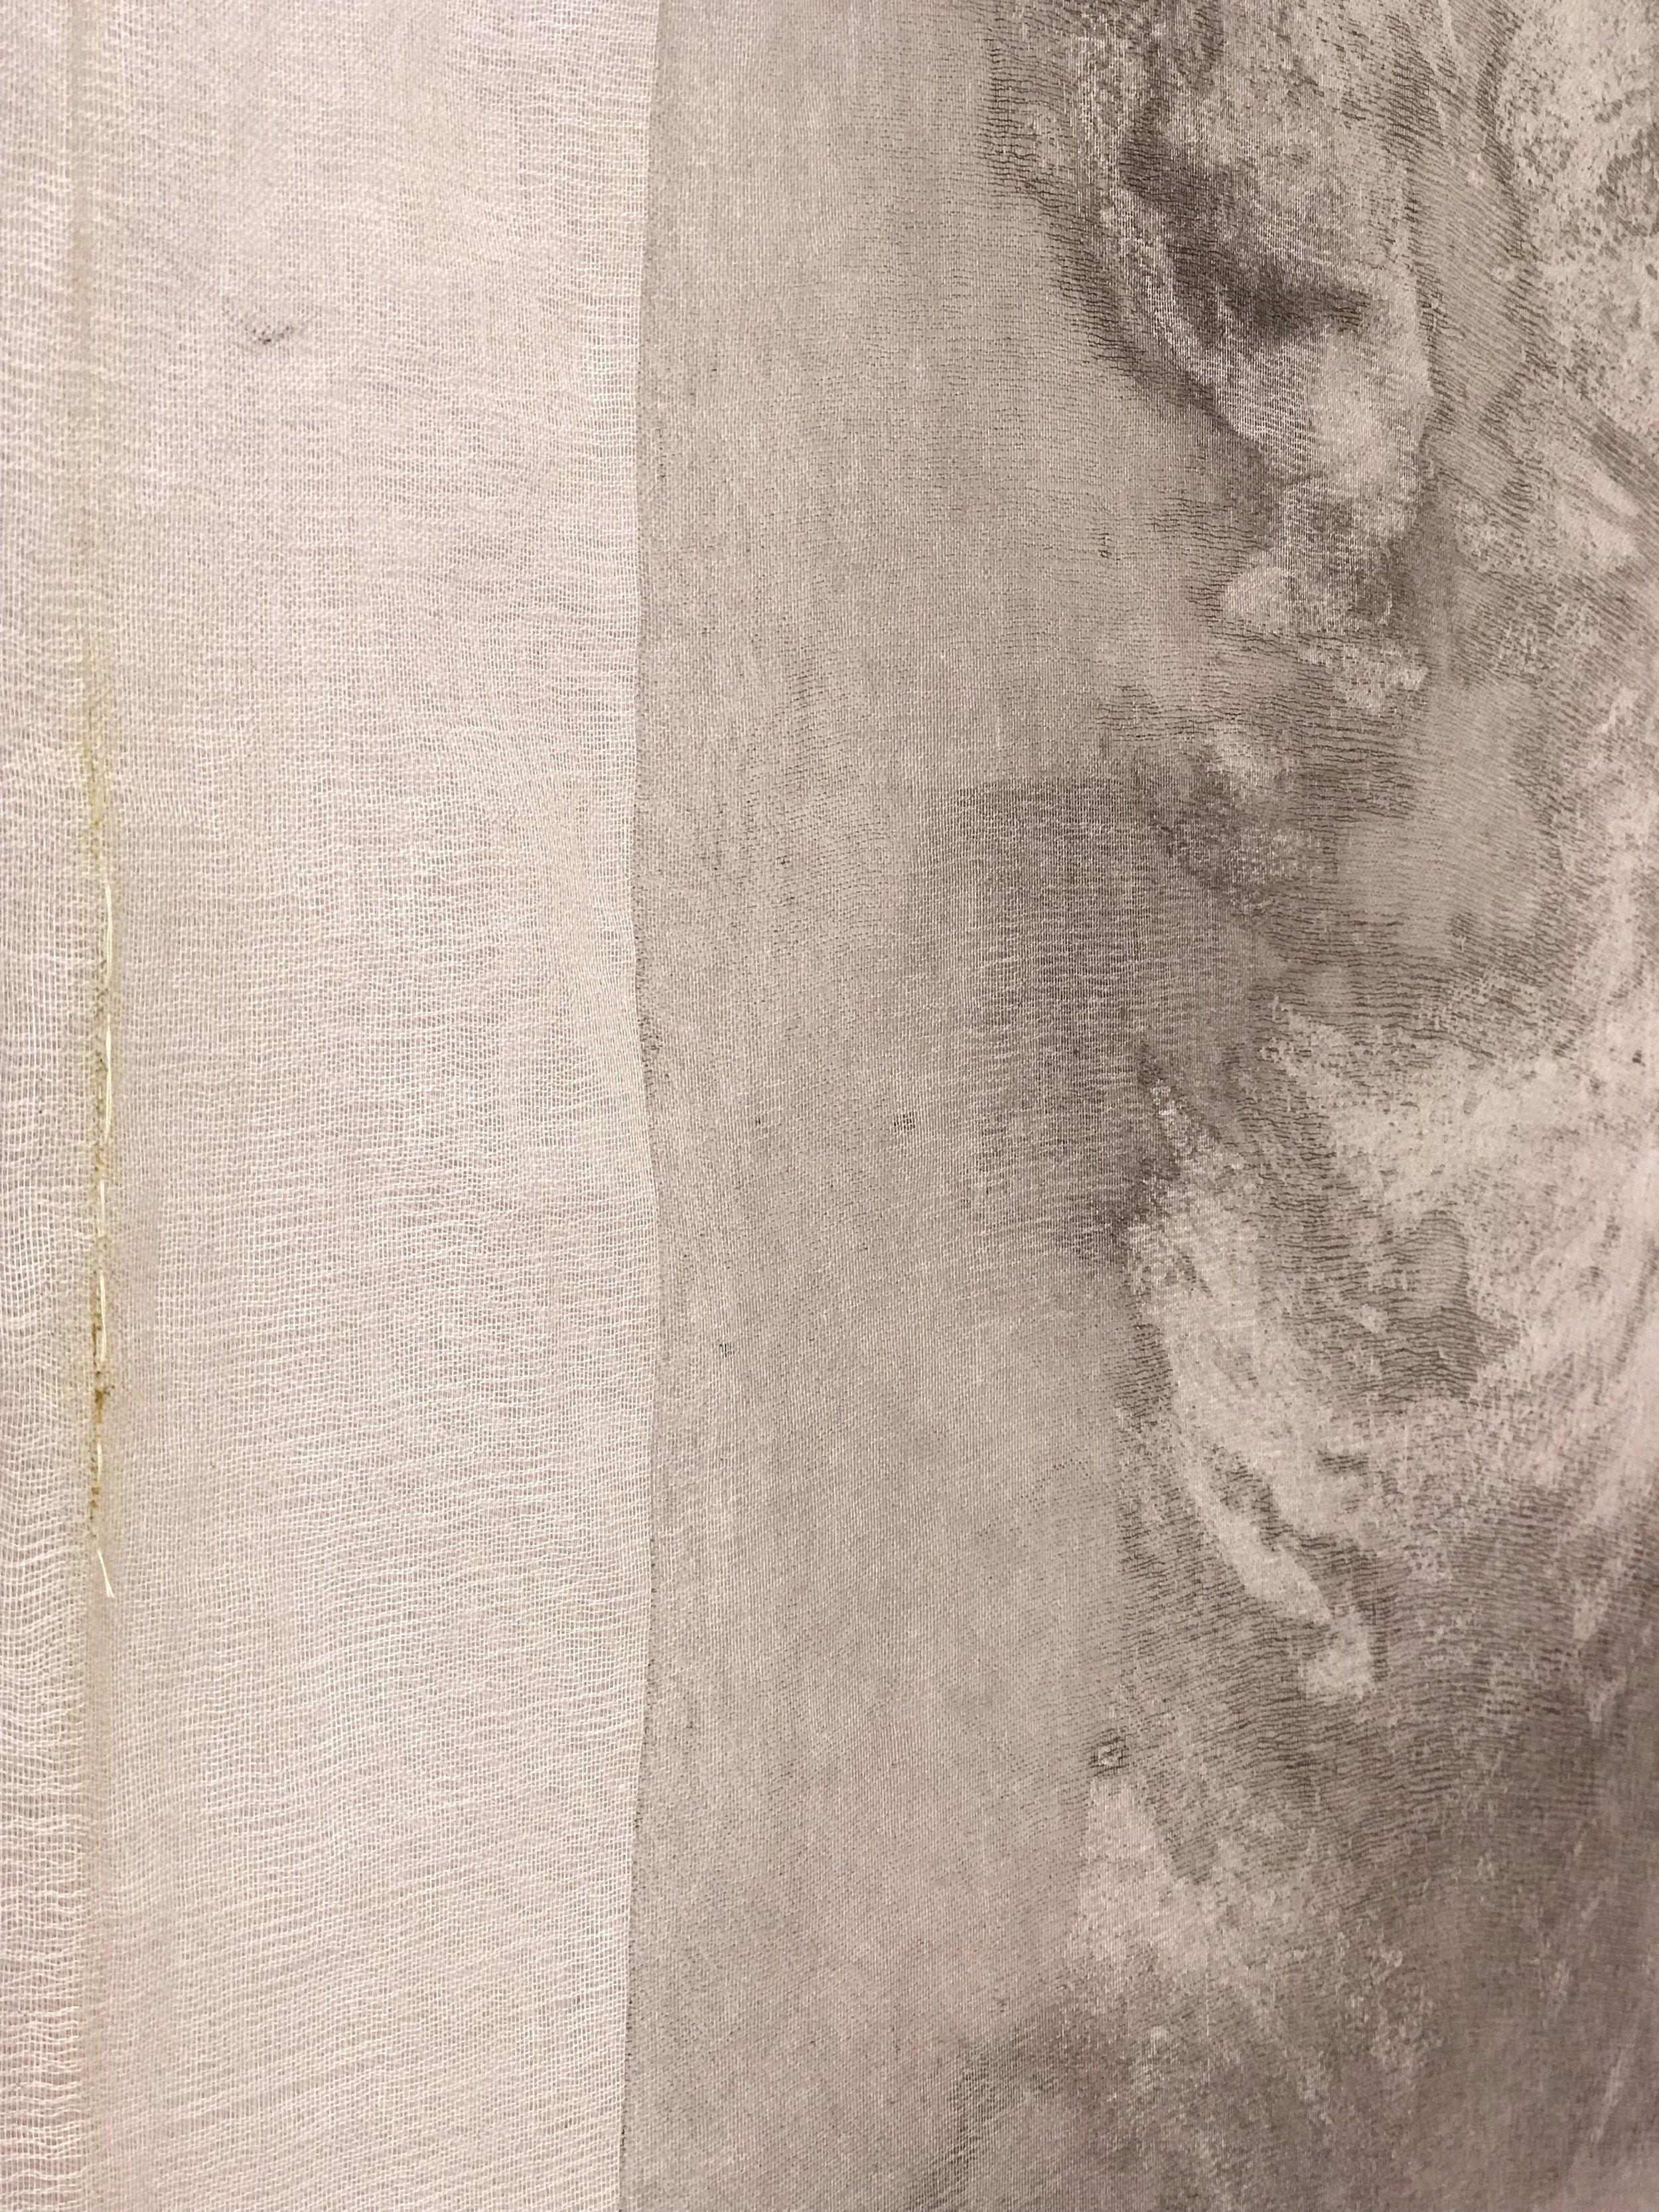 """She is Gone,"" 65"" x 37"", collograph carborundom print on tarleton, hand dyed silk charmause, thread, glue, poplar  DETAIL"